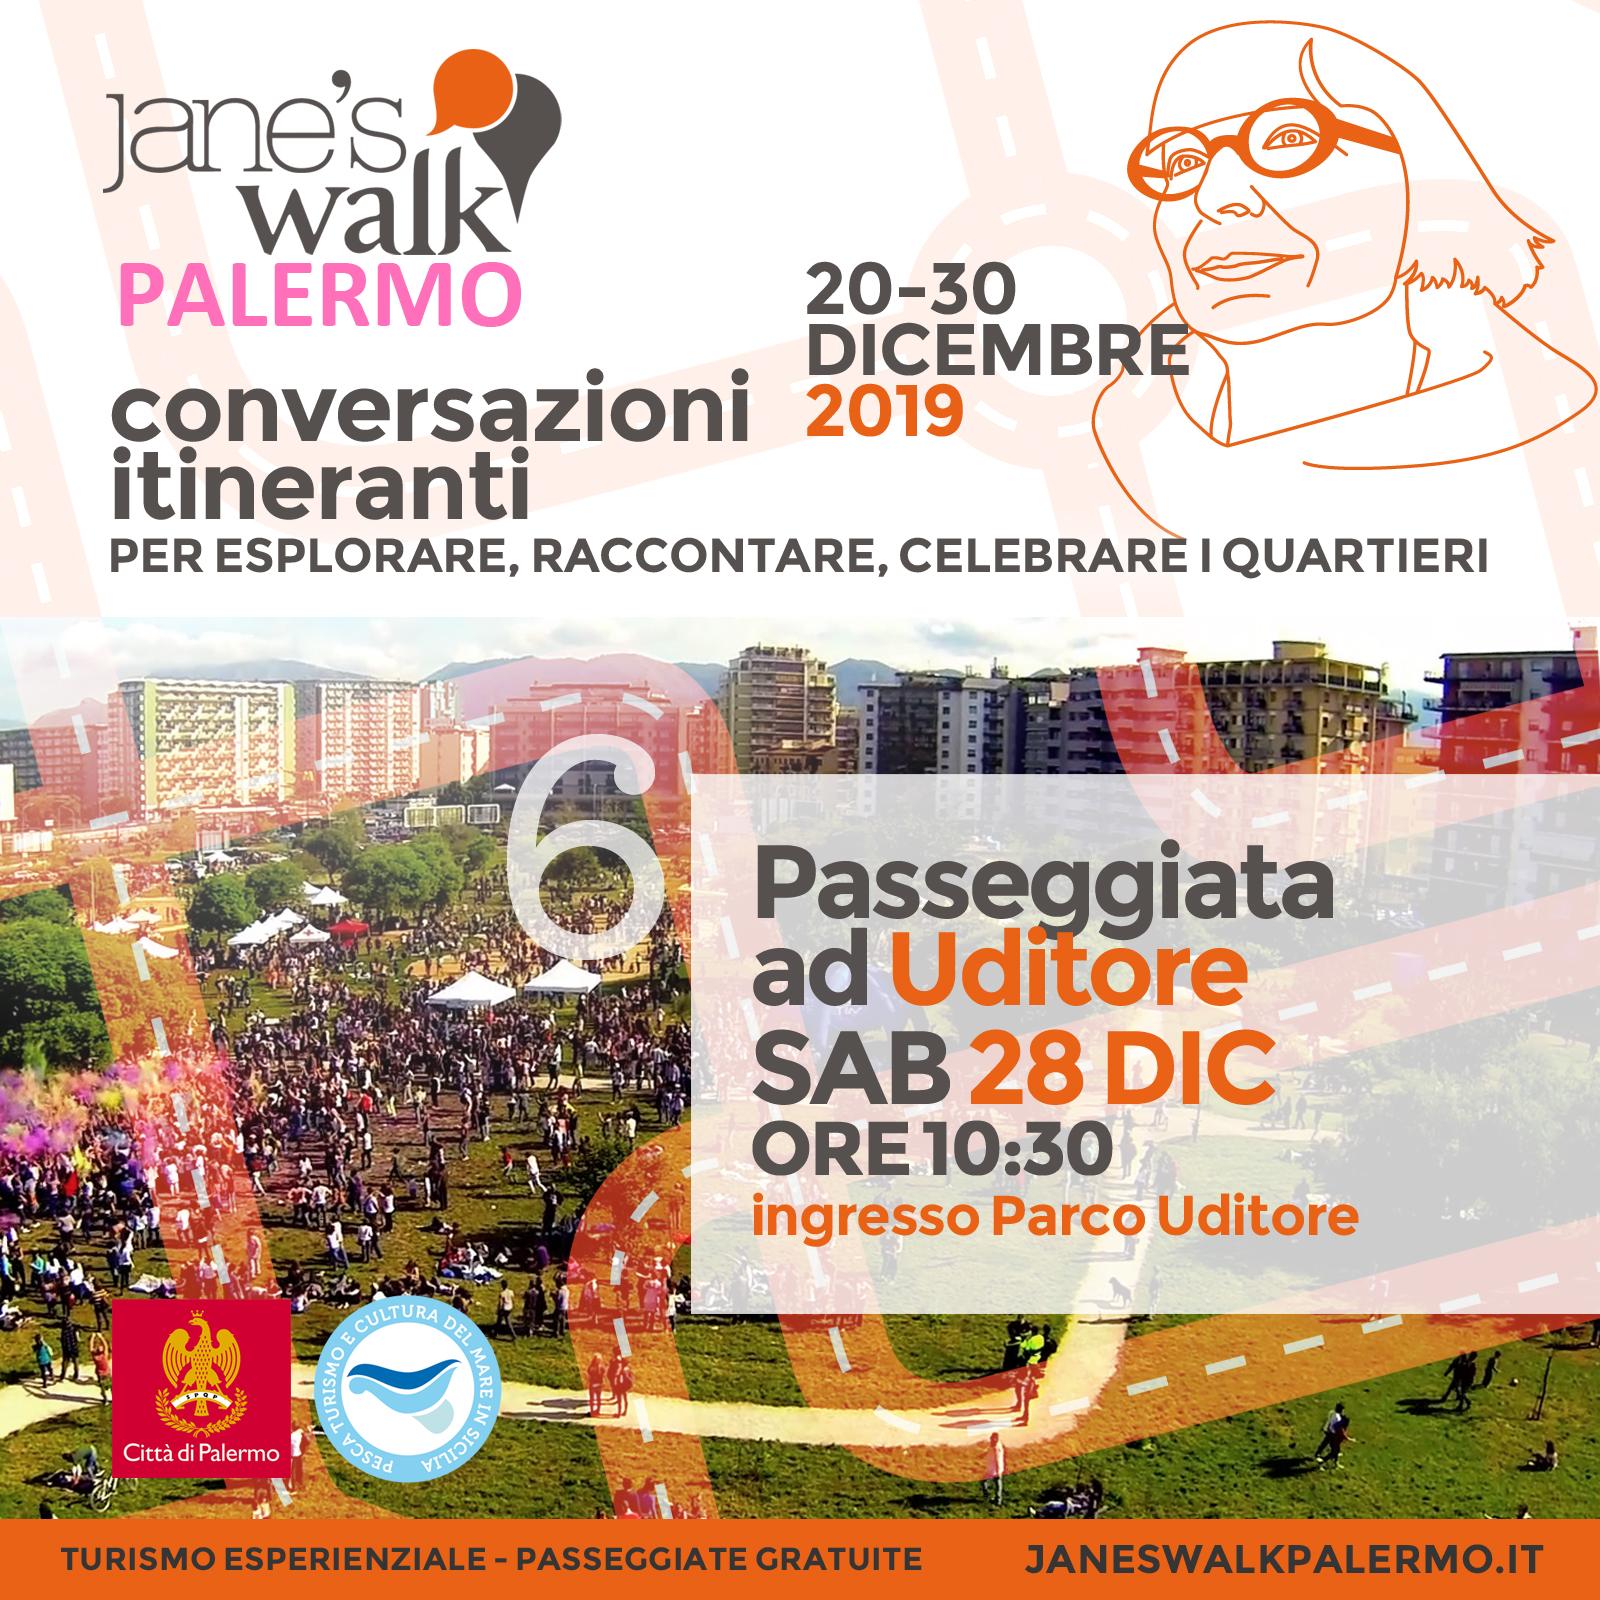 Jane's Walk Palermo - Passeggiata ad Uditore